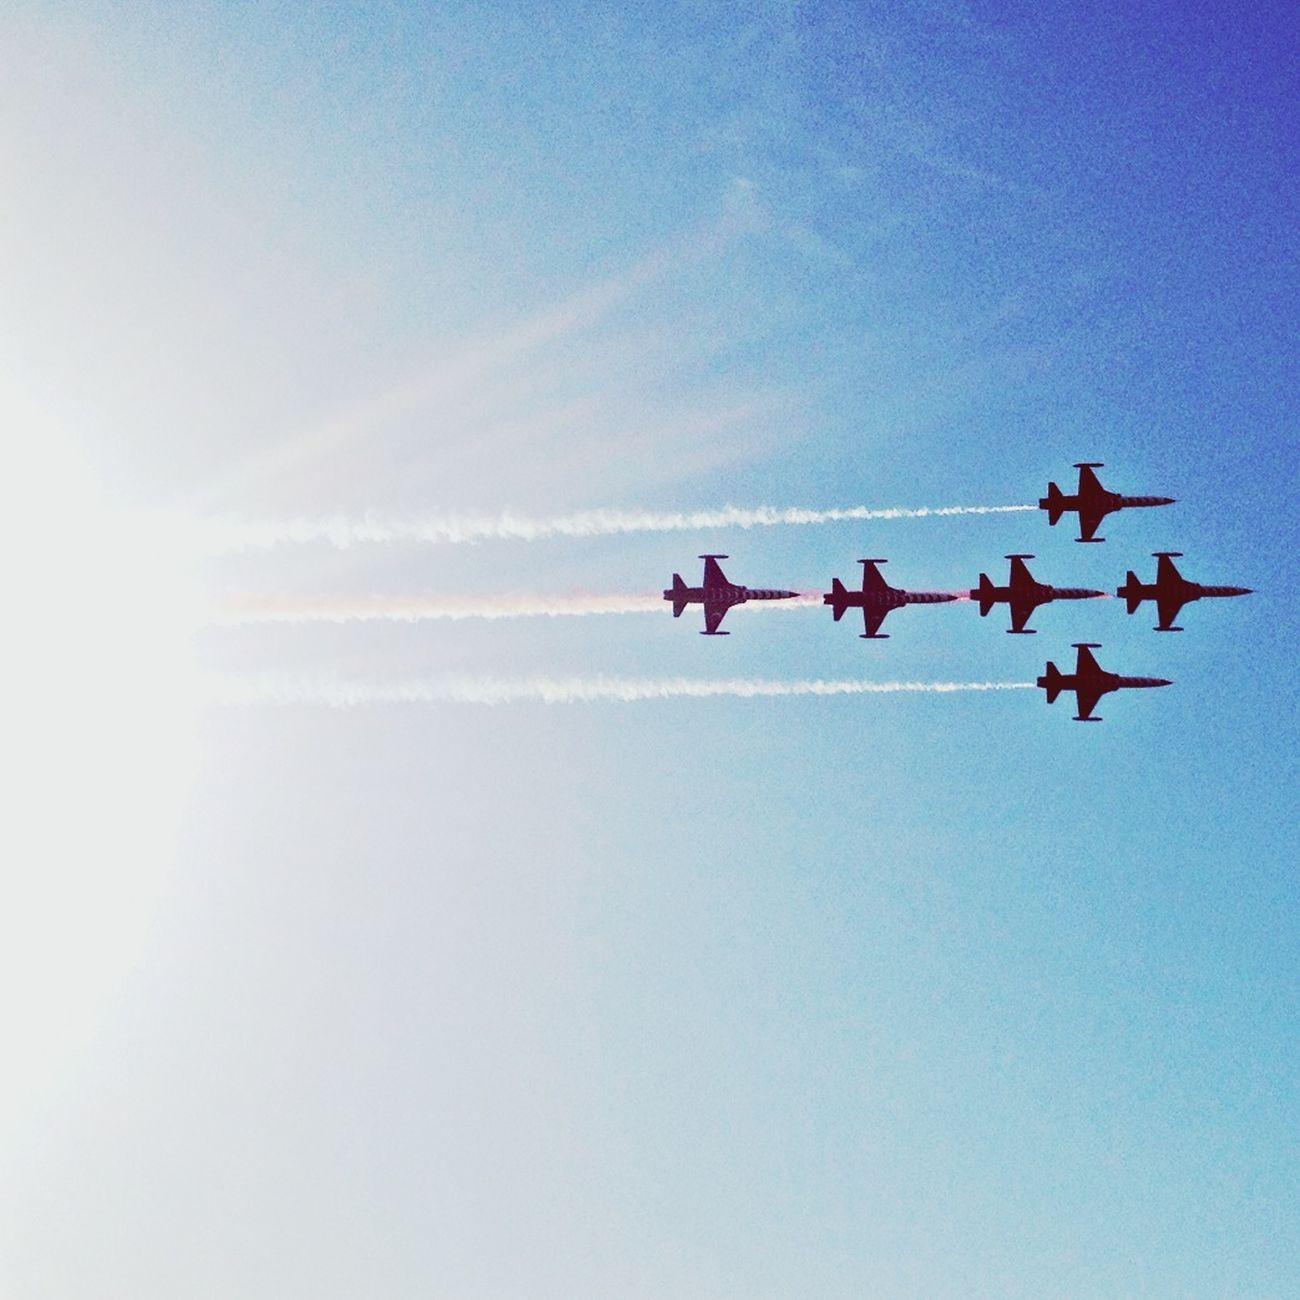 Aircraft show